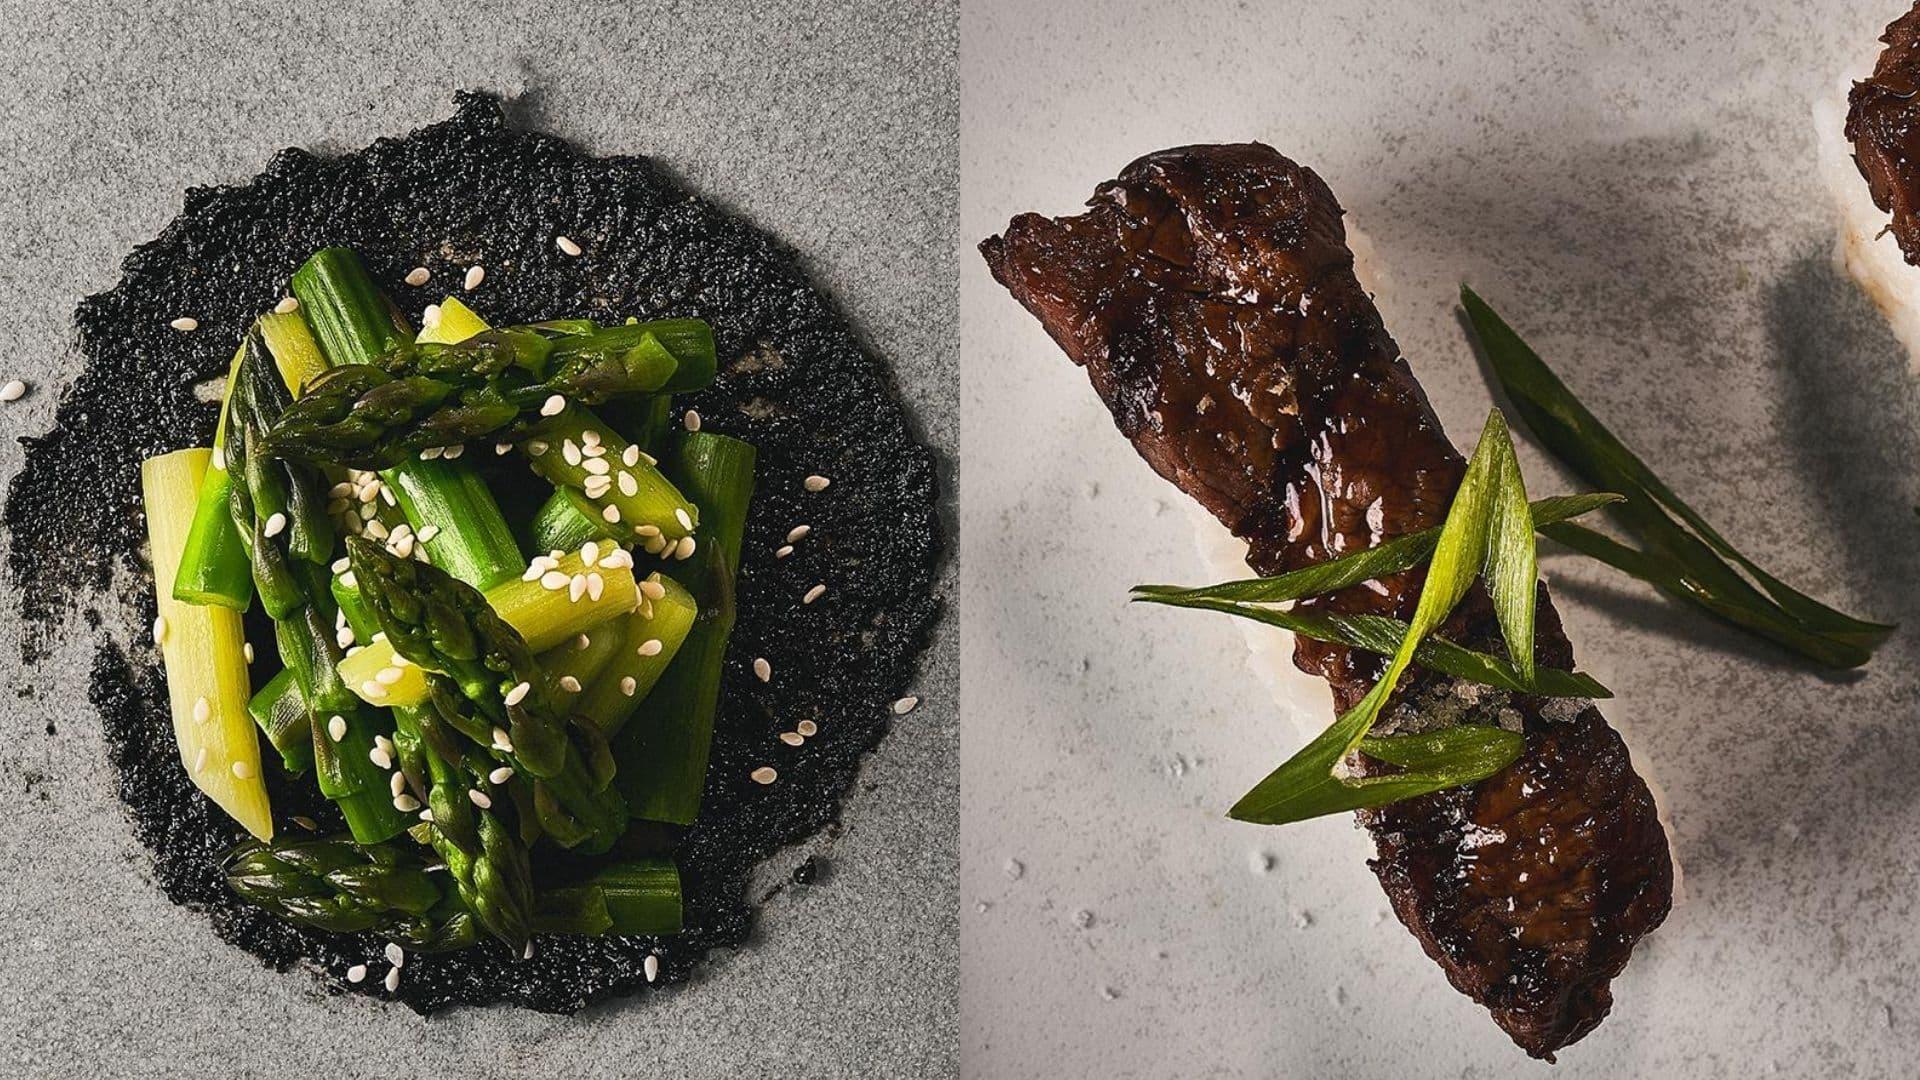 Beef Nigiri Asparagus with Black Sesame 1920 1080